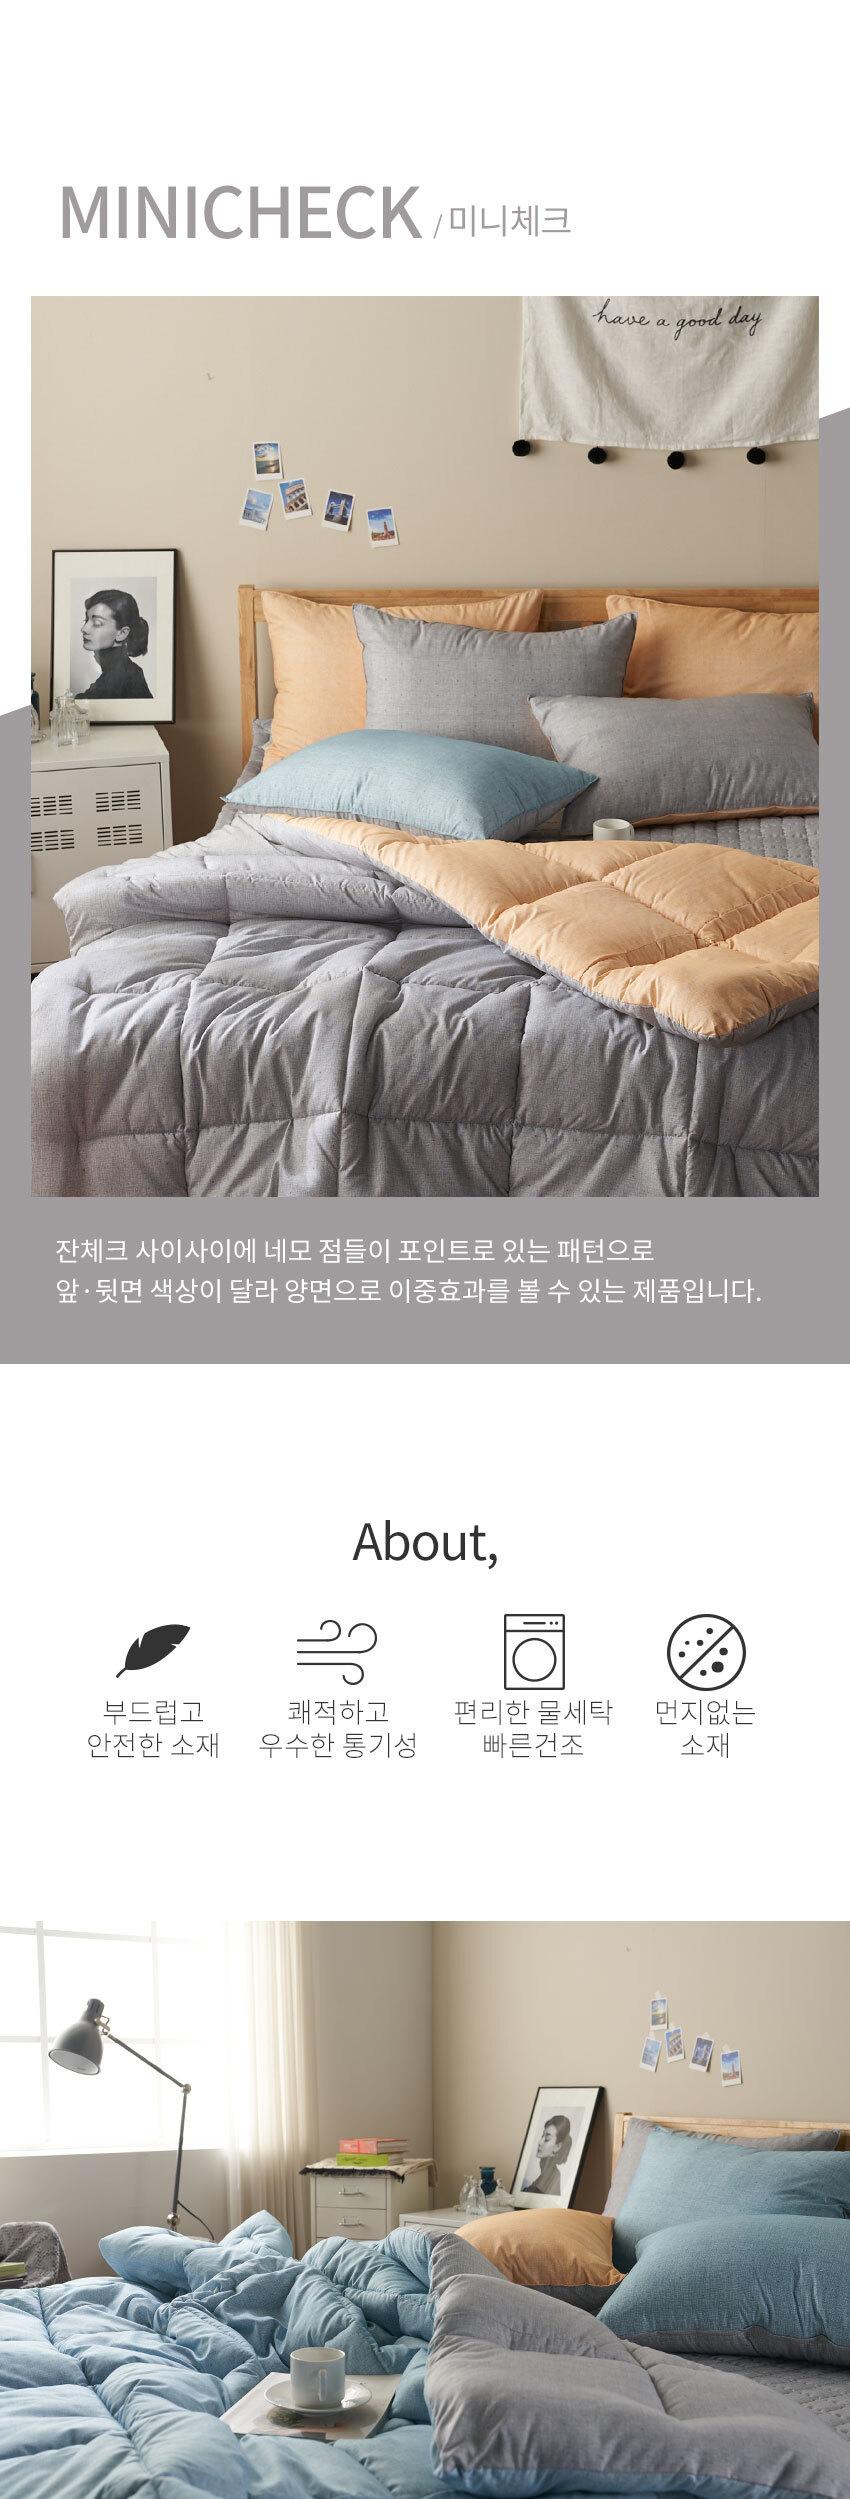 minicheck_bed_top.jpg